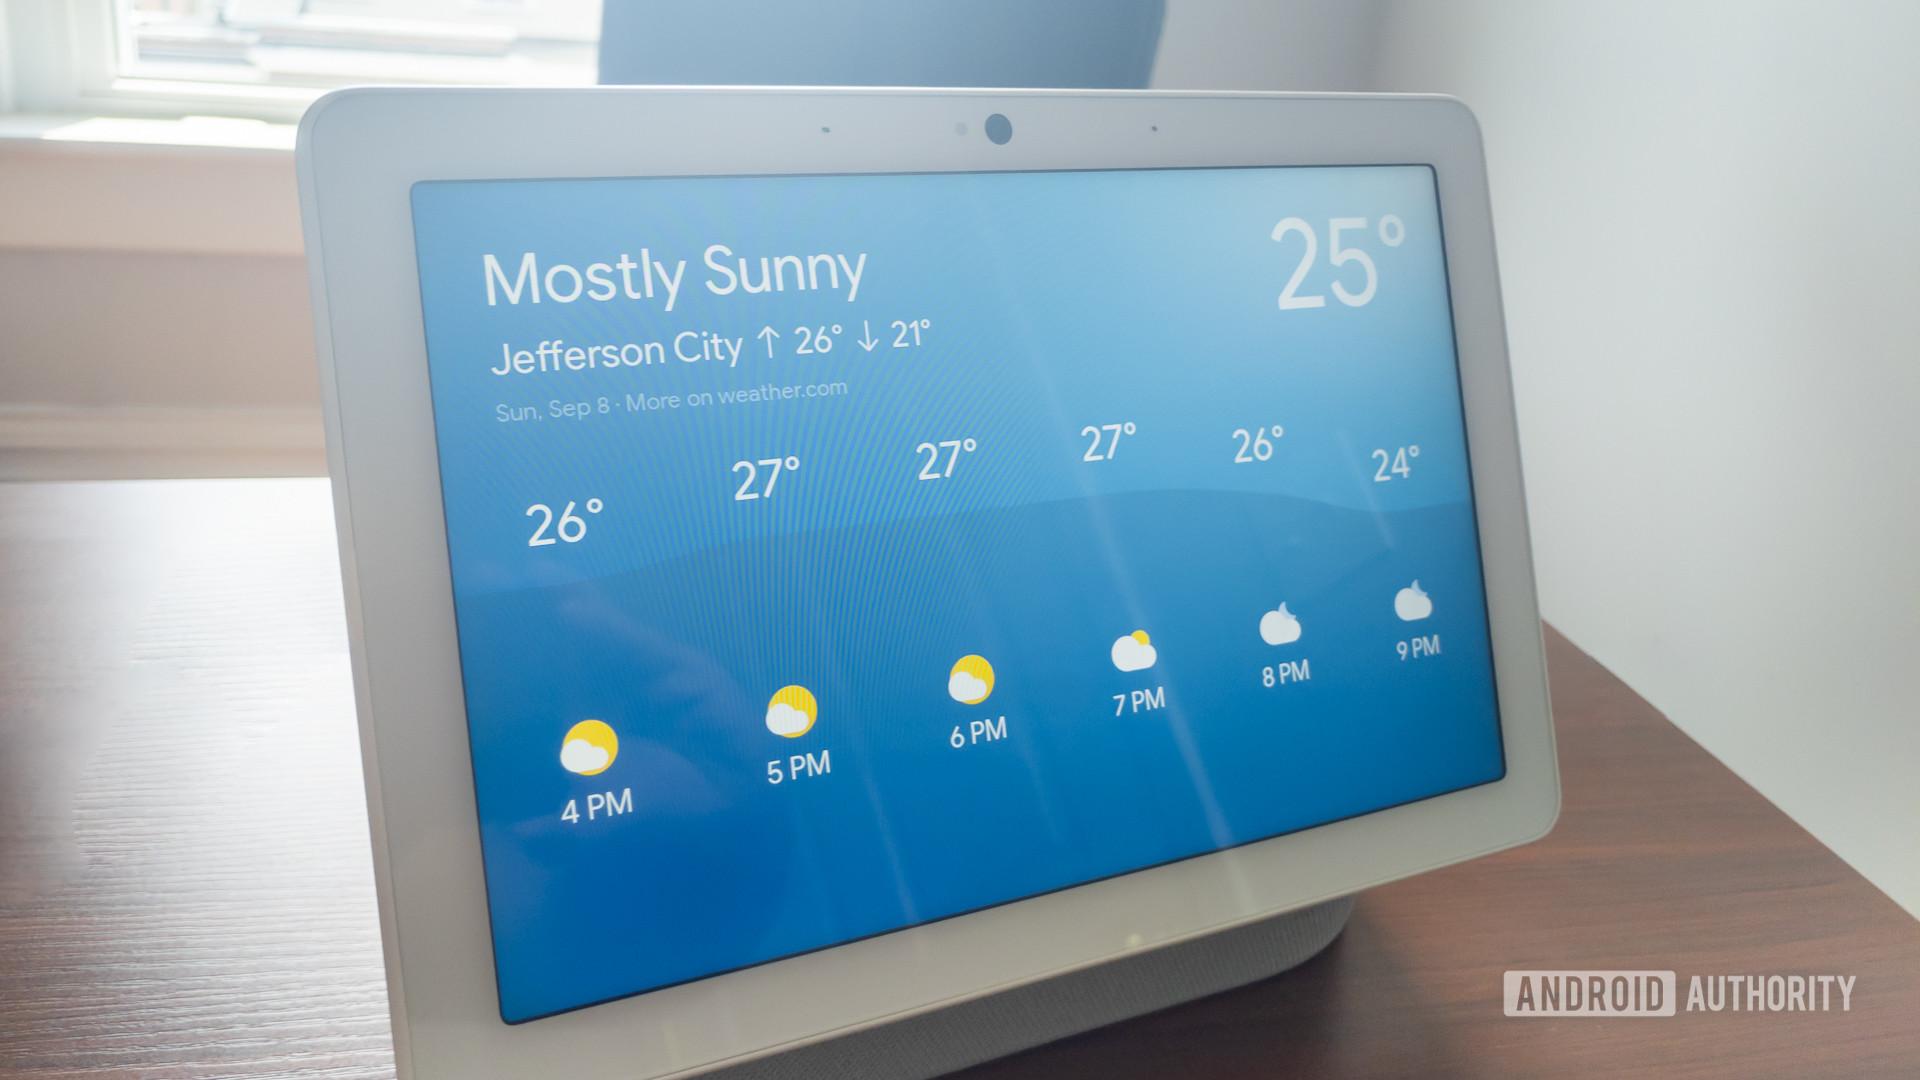 Google Home Hub Max weather screen